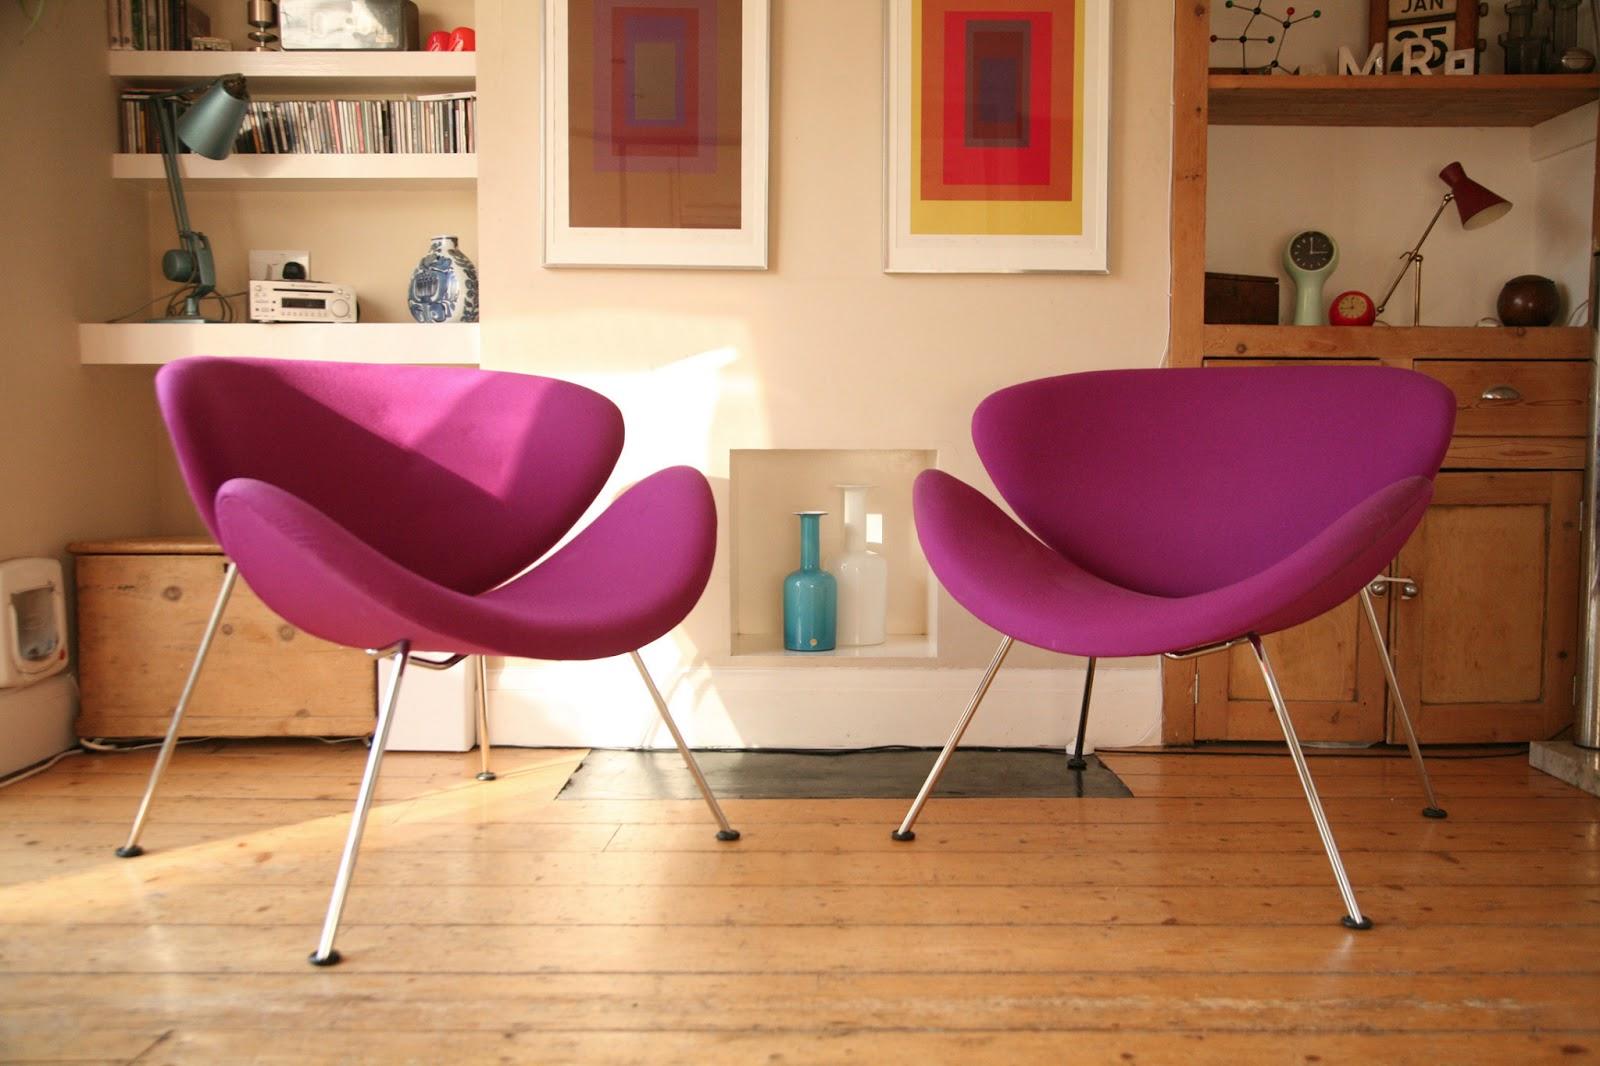 Pierre Paulin Orange Slice Chair From 1960 By Artifort | © Cream U0026 Chrome  Vintage Furniture U0026 Lighting Stardust.com